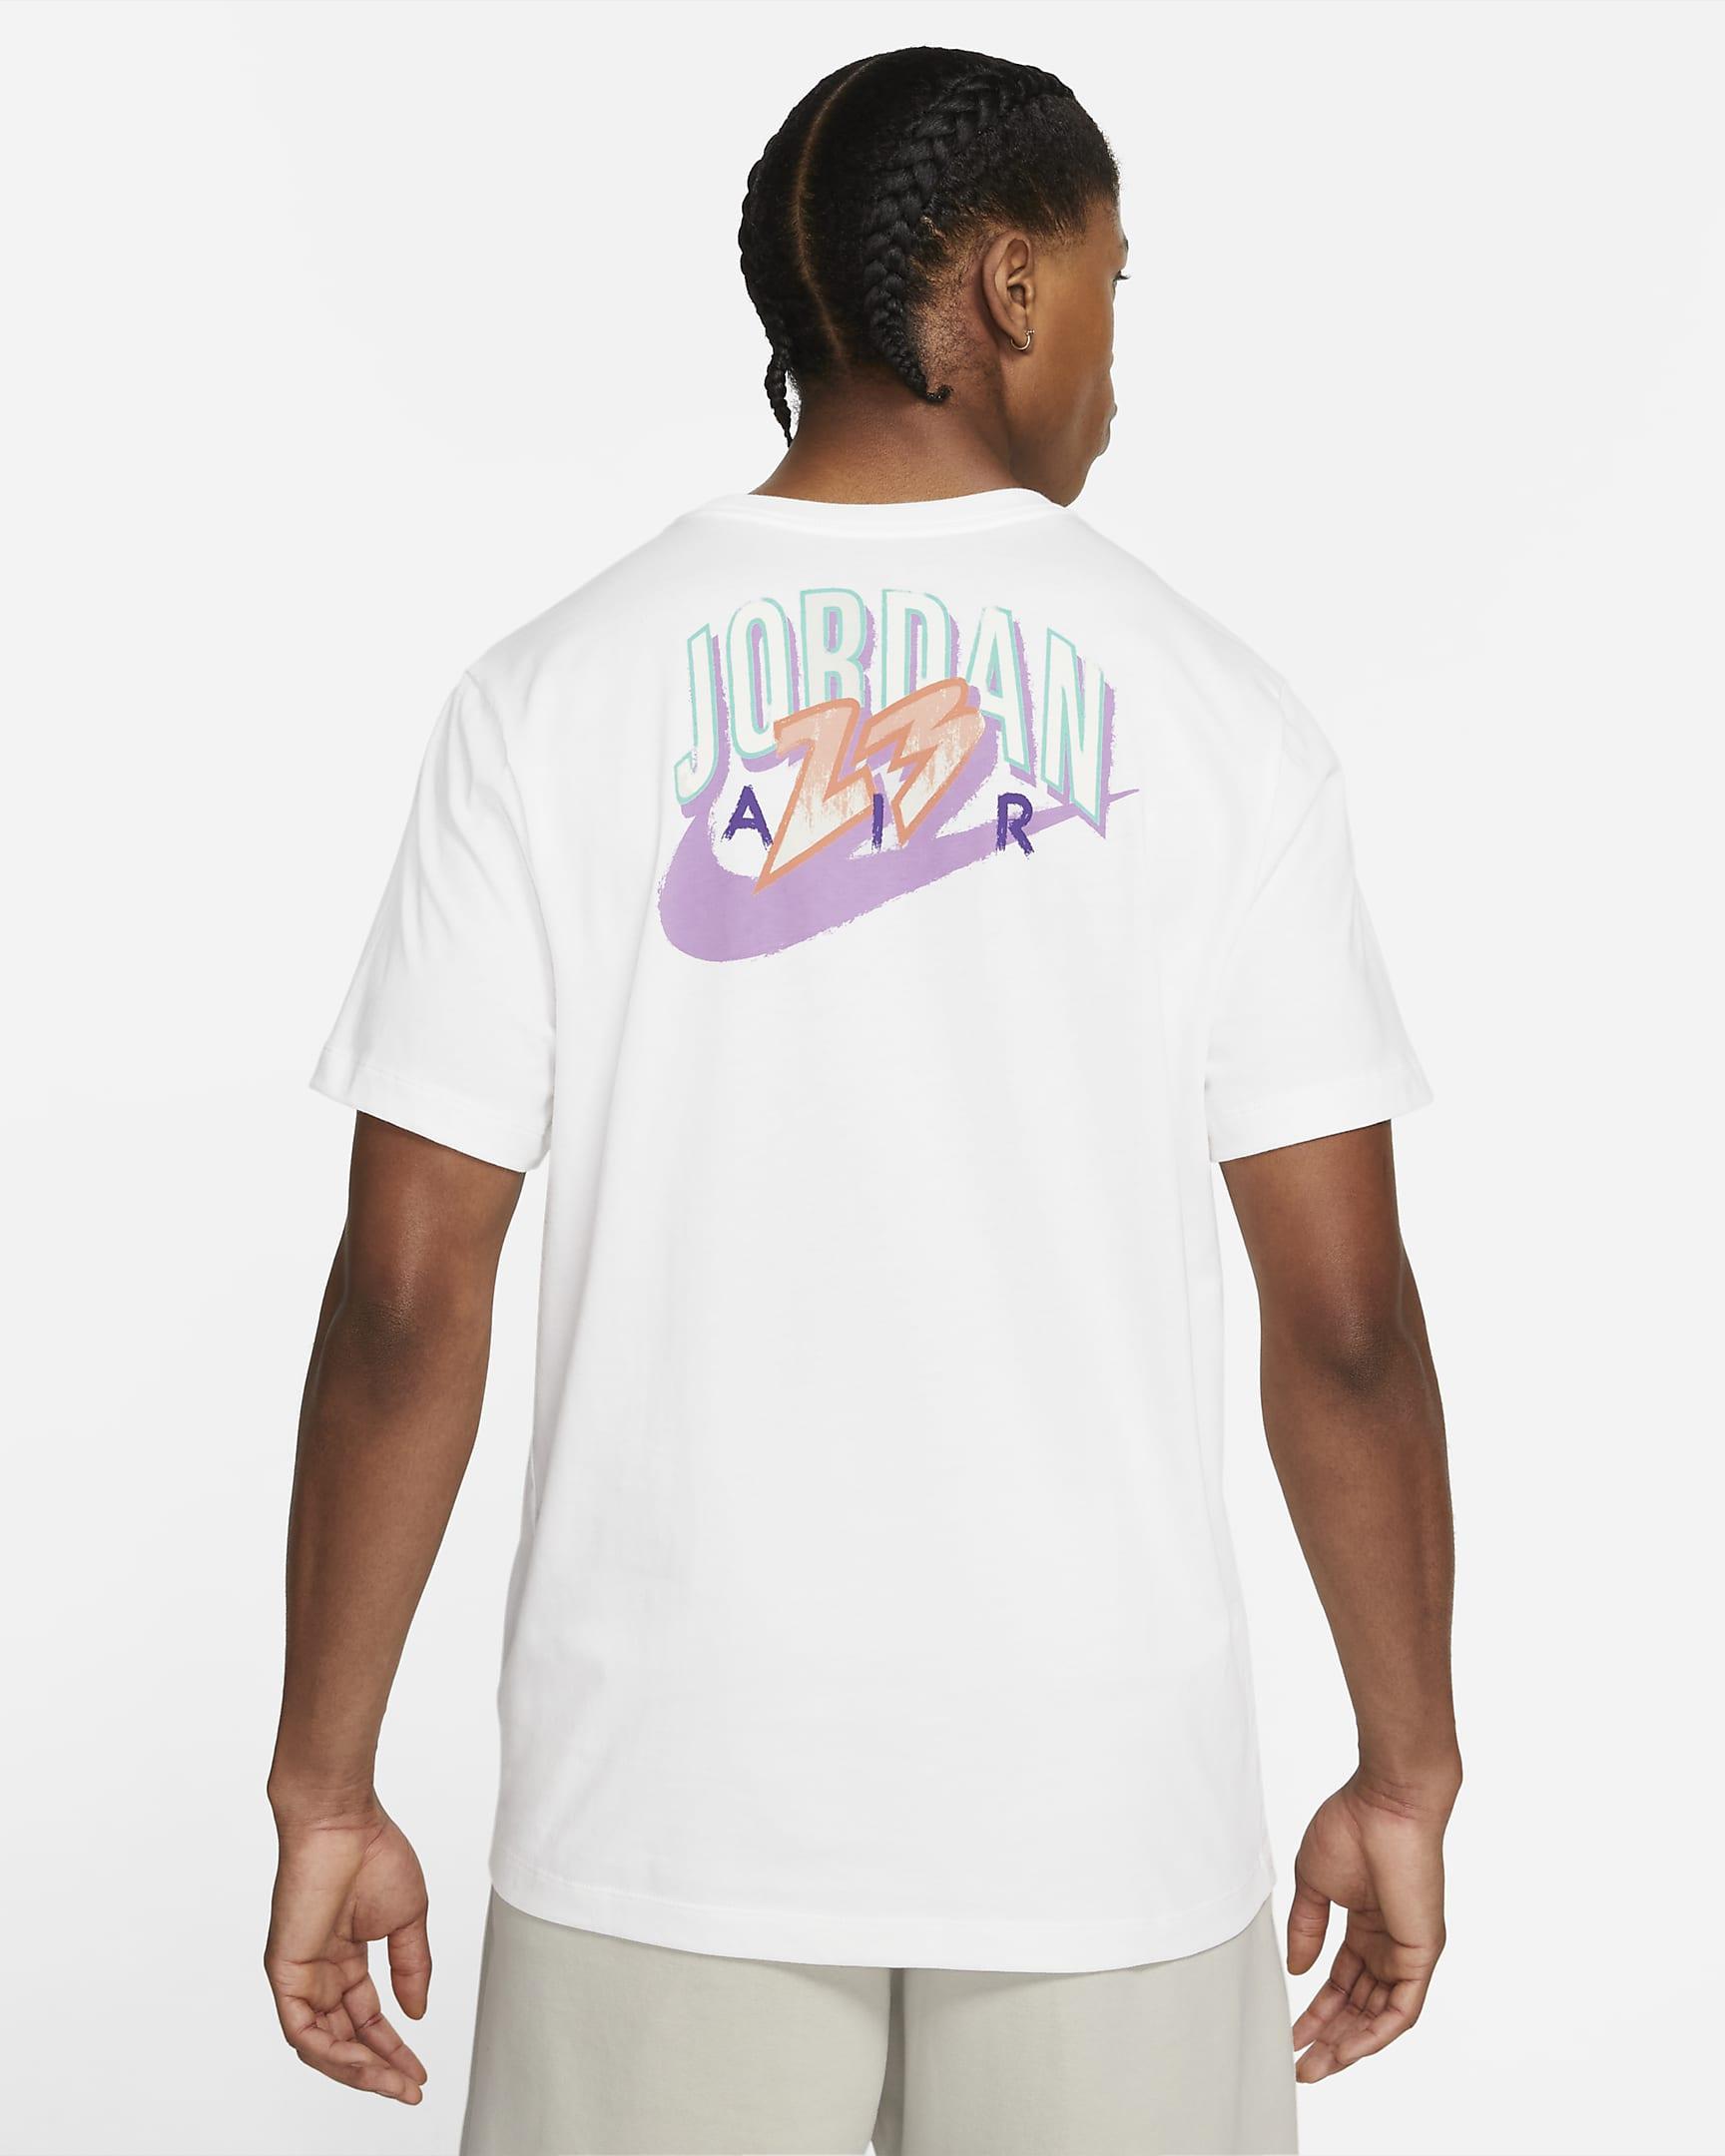 jordan-23-swoosh-mens-short-sleeve-t-shirt-2nxH4t-1.png